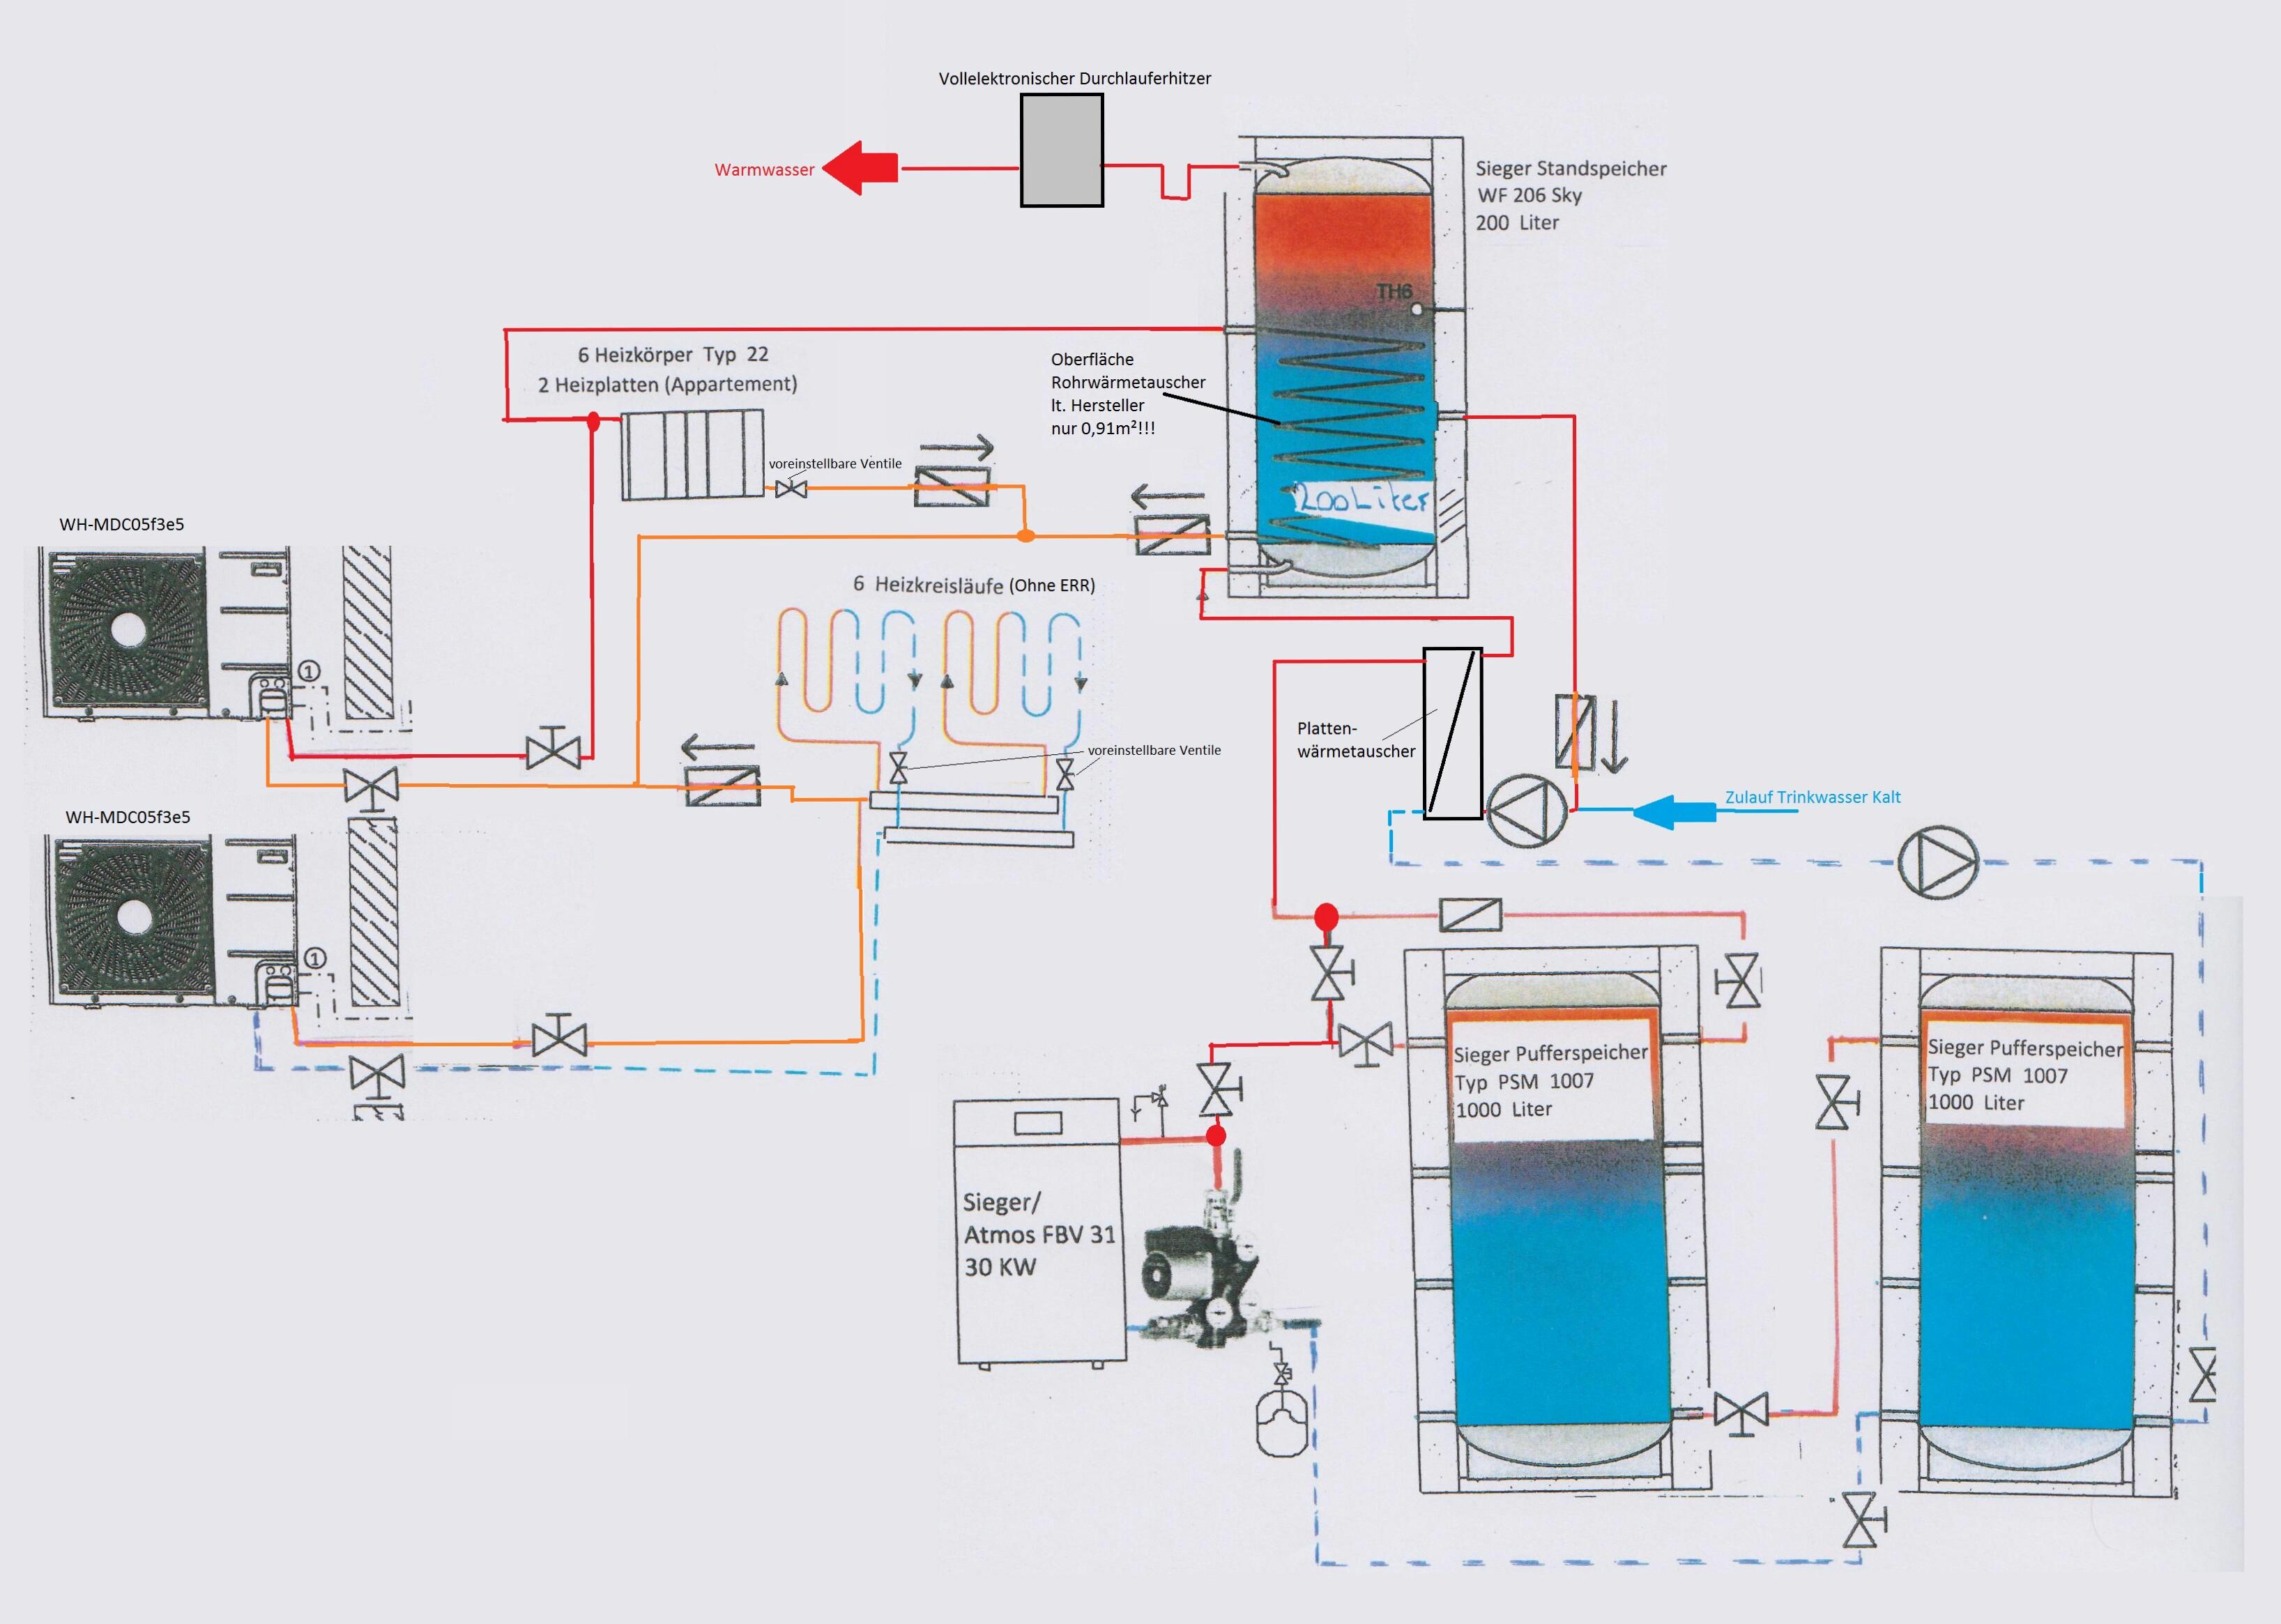 Hydraulik Plan - HaustechnikDialog